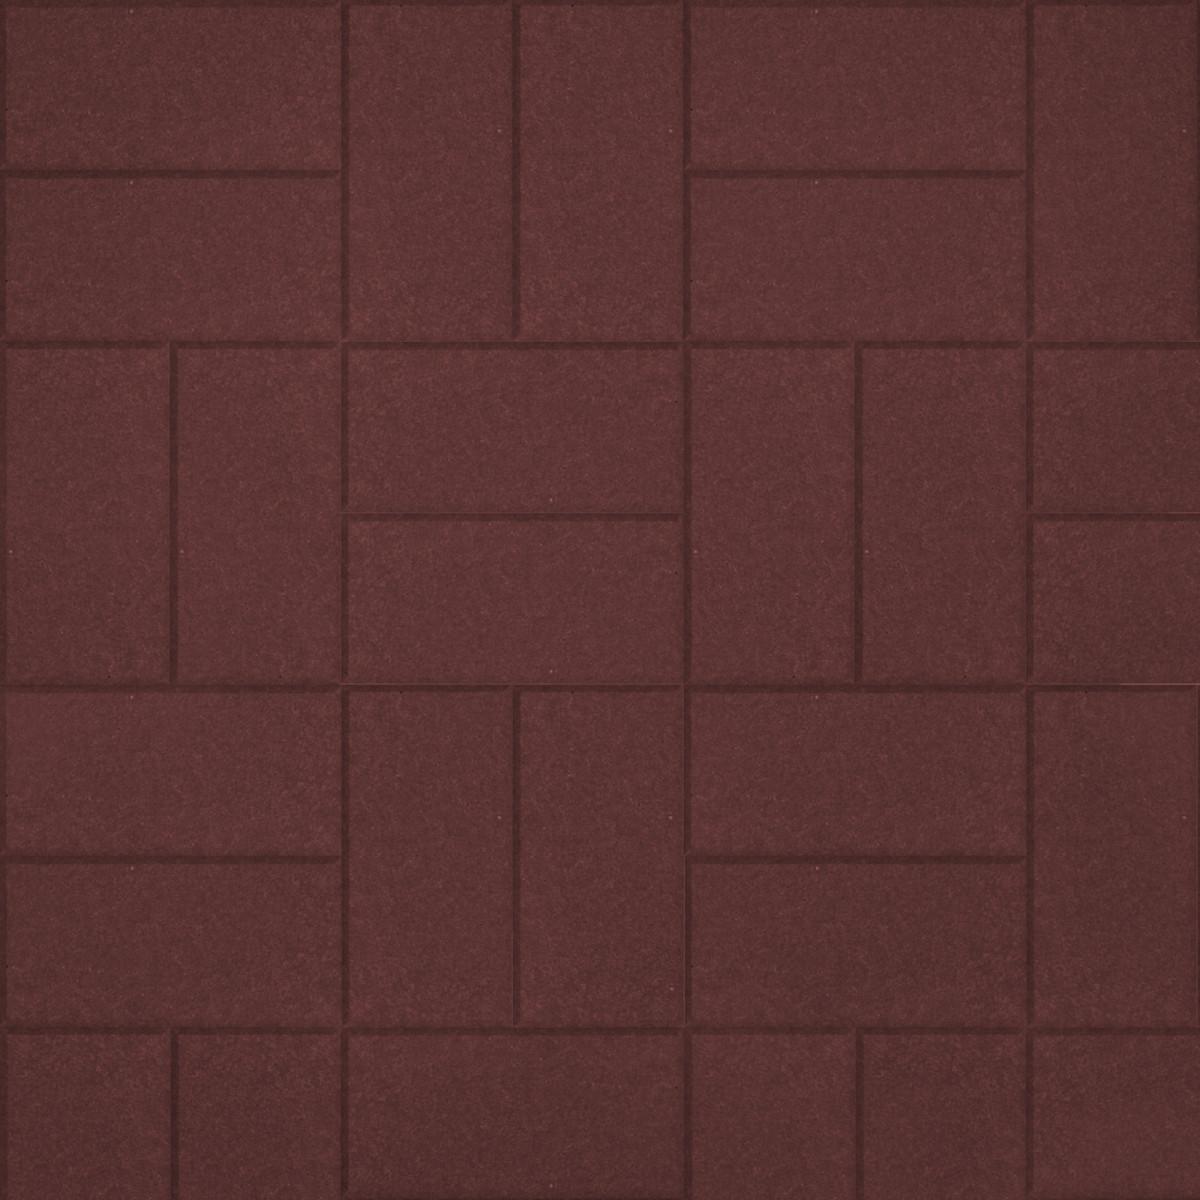 Тротуарная плитка Кирпичик 200х100х60 мм коричневый